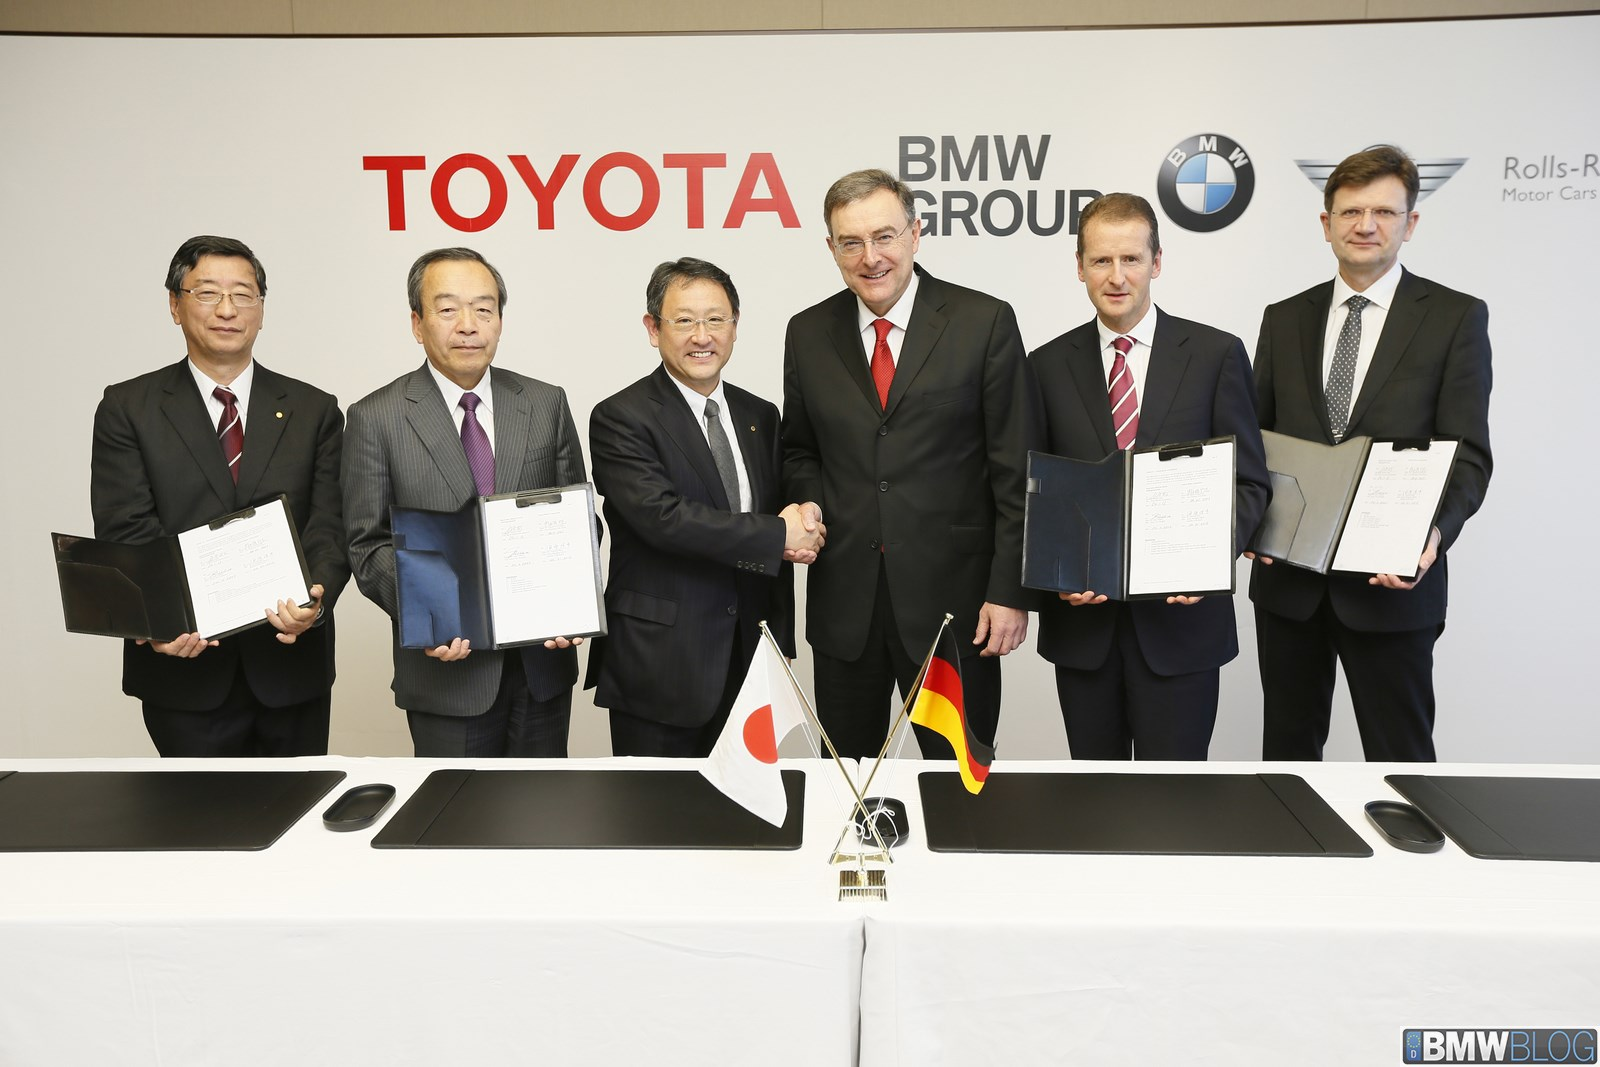 bmw toyota agreement 01